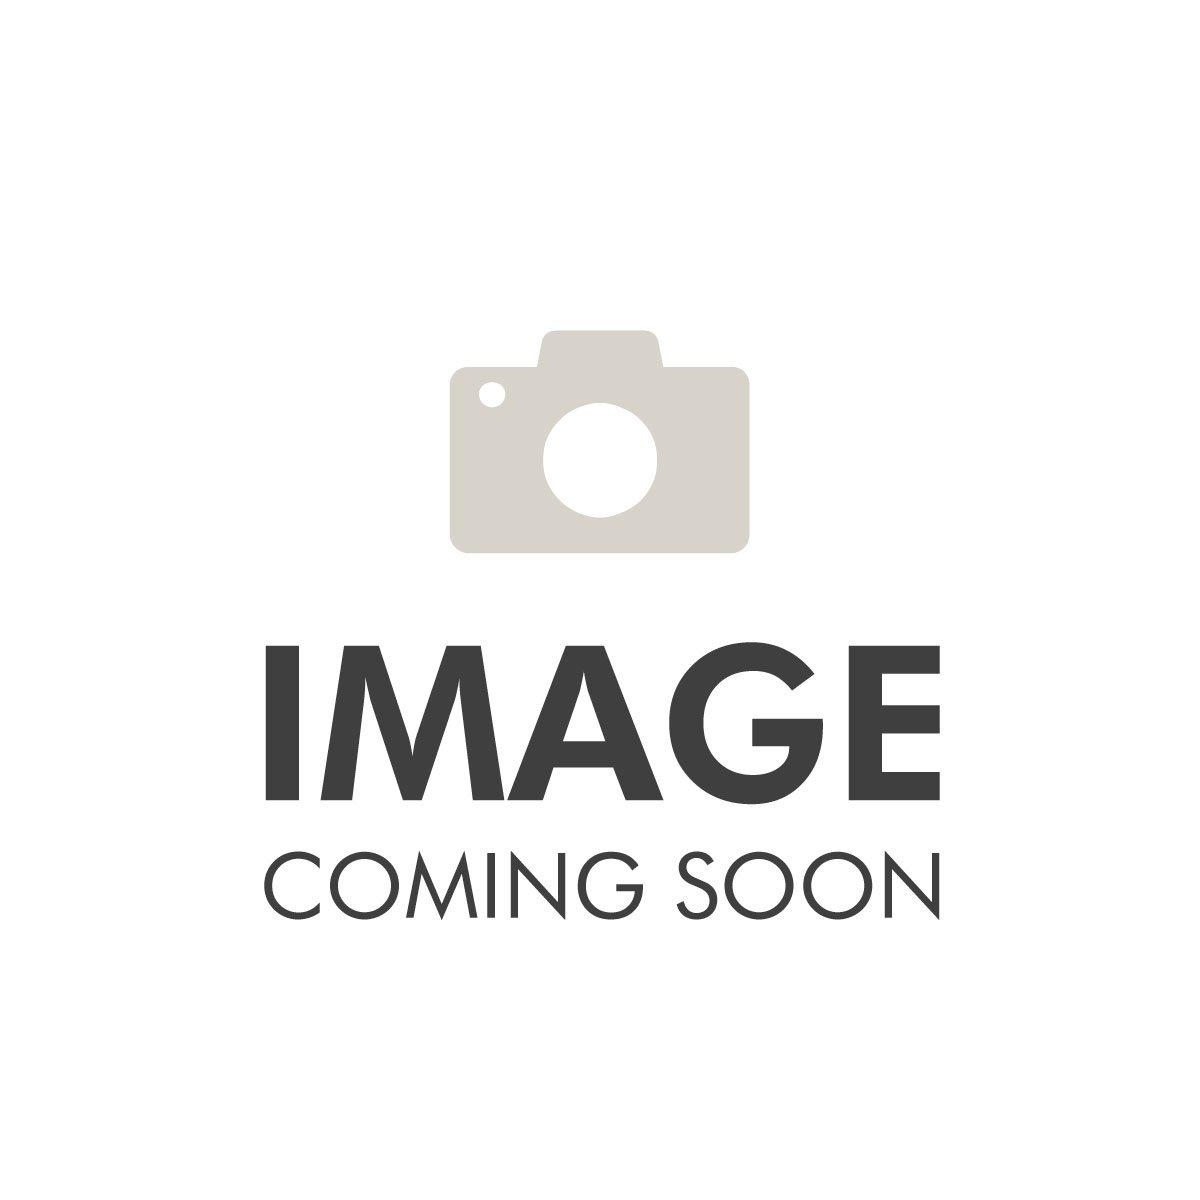 Thierry Mugler Amen 15ml EDT Travel Spray + 2x 15ml EDT Refills